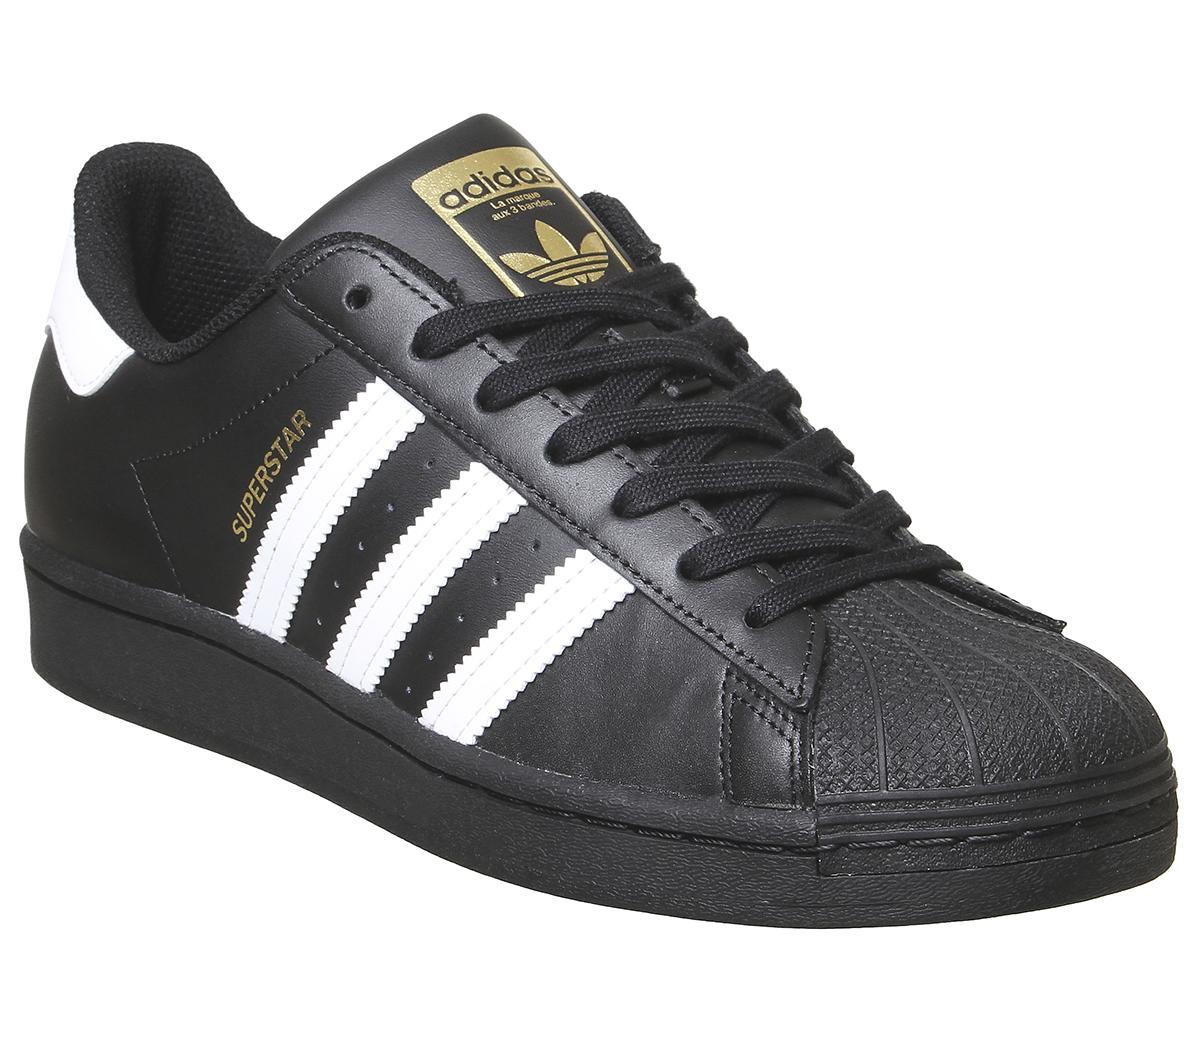 adidas Superstar Trainers Black White